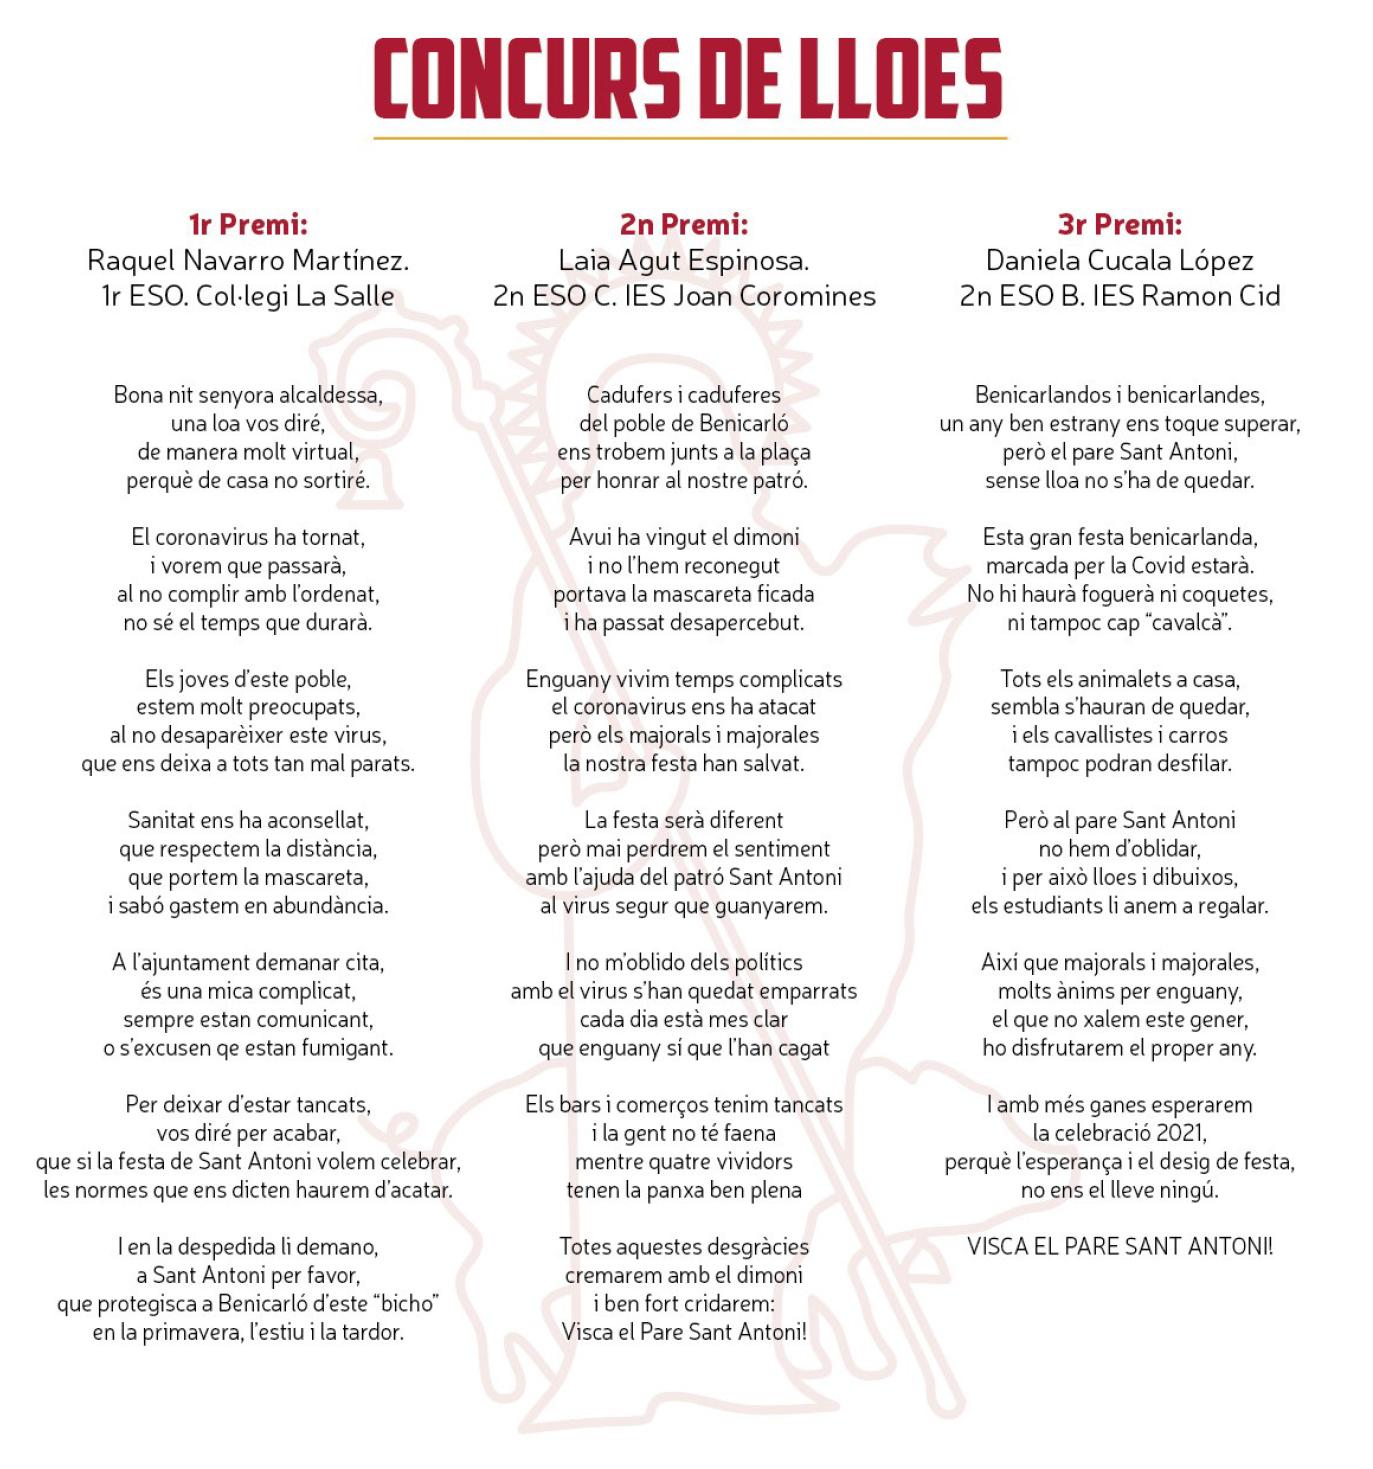 Concurs lloes 2021-Sant Antoni Benicarló